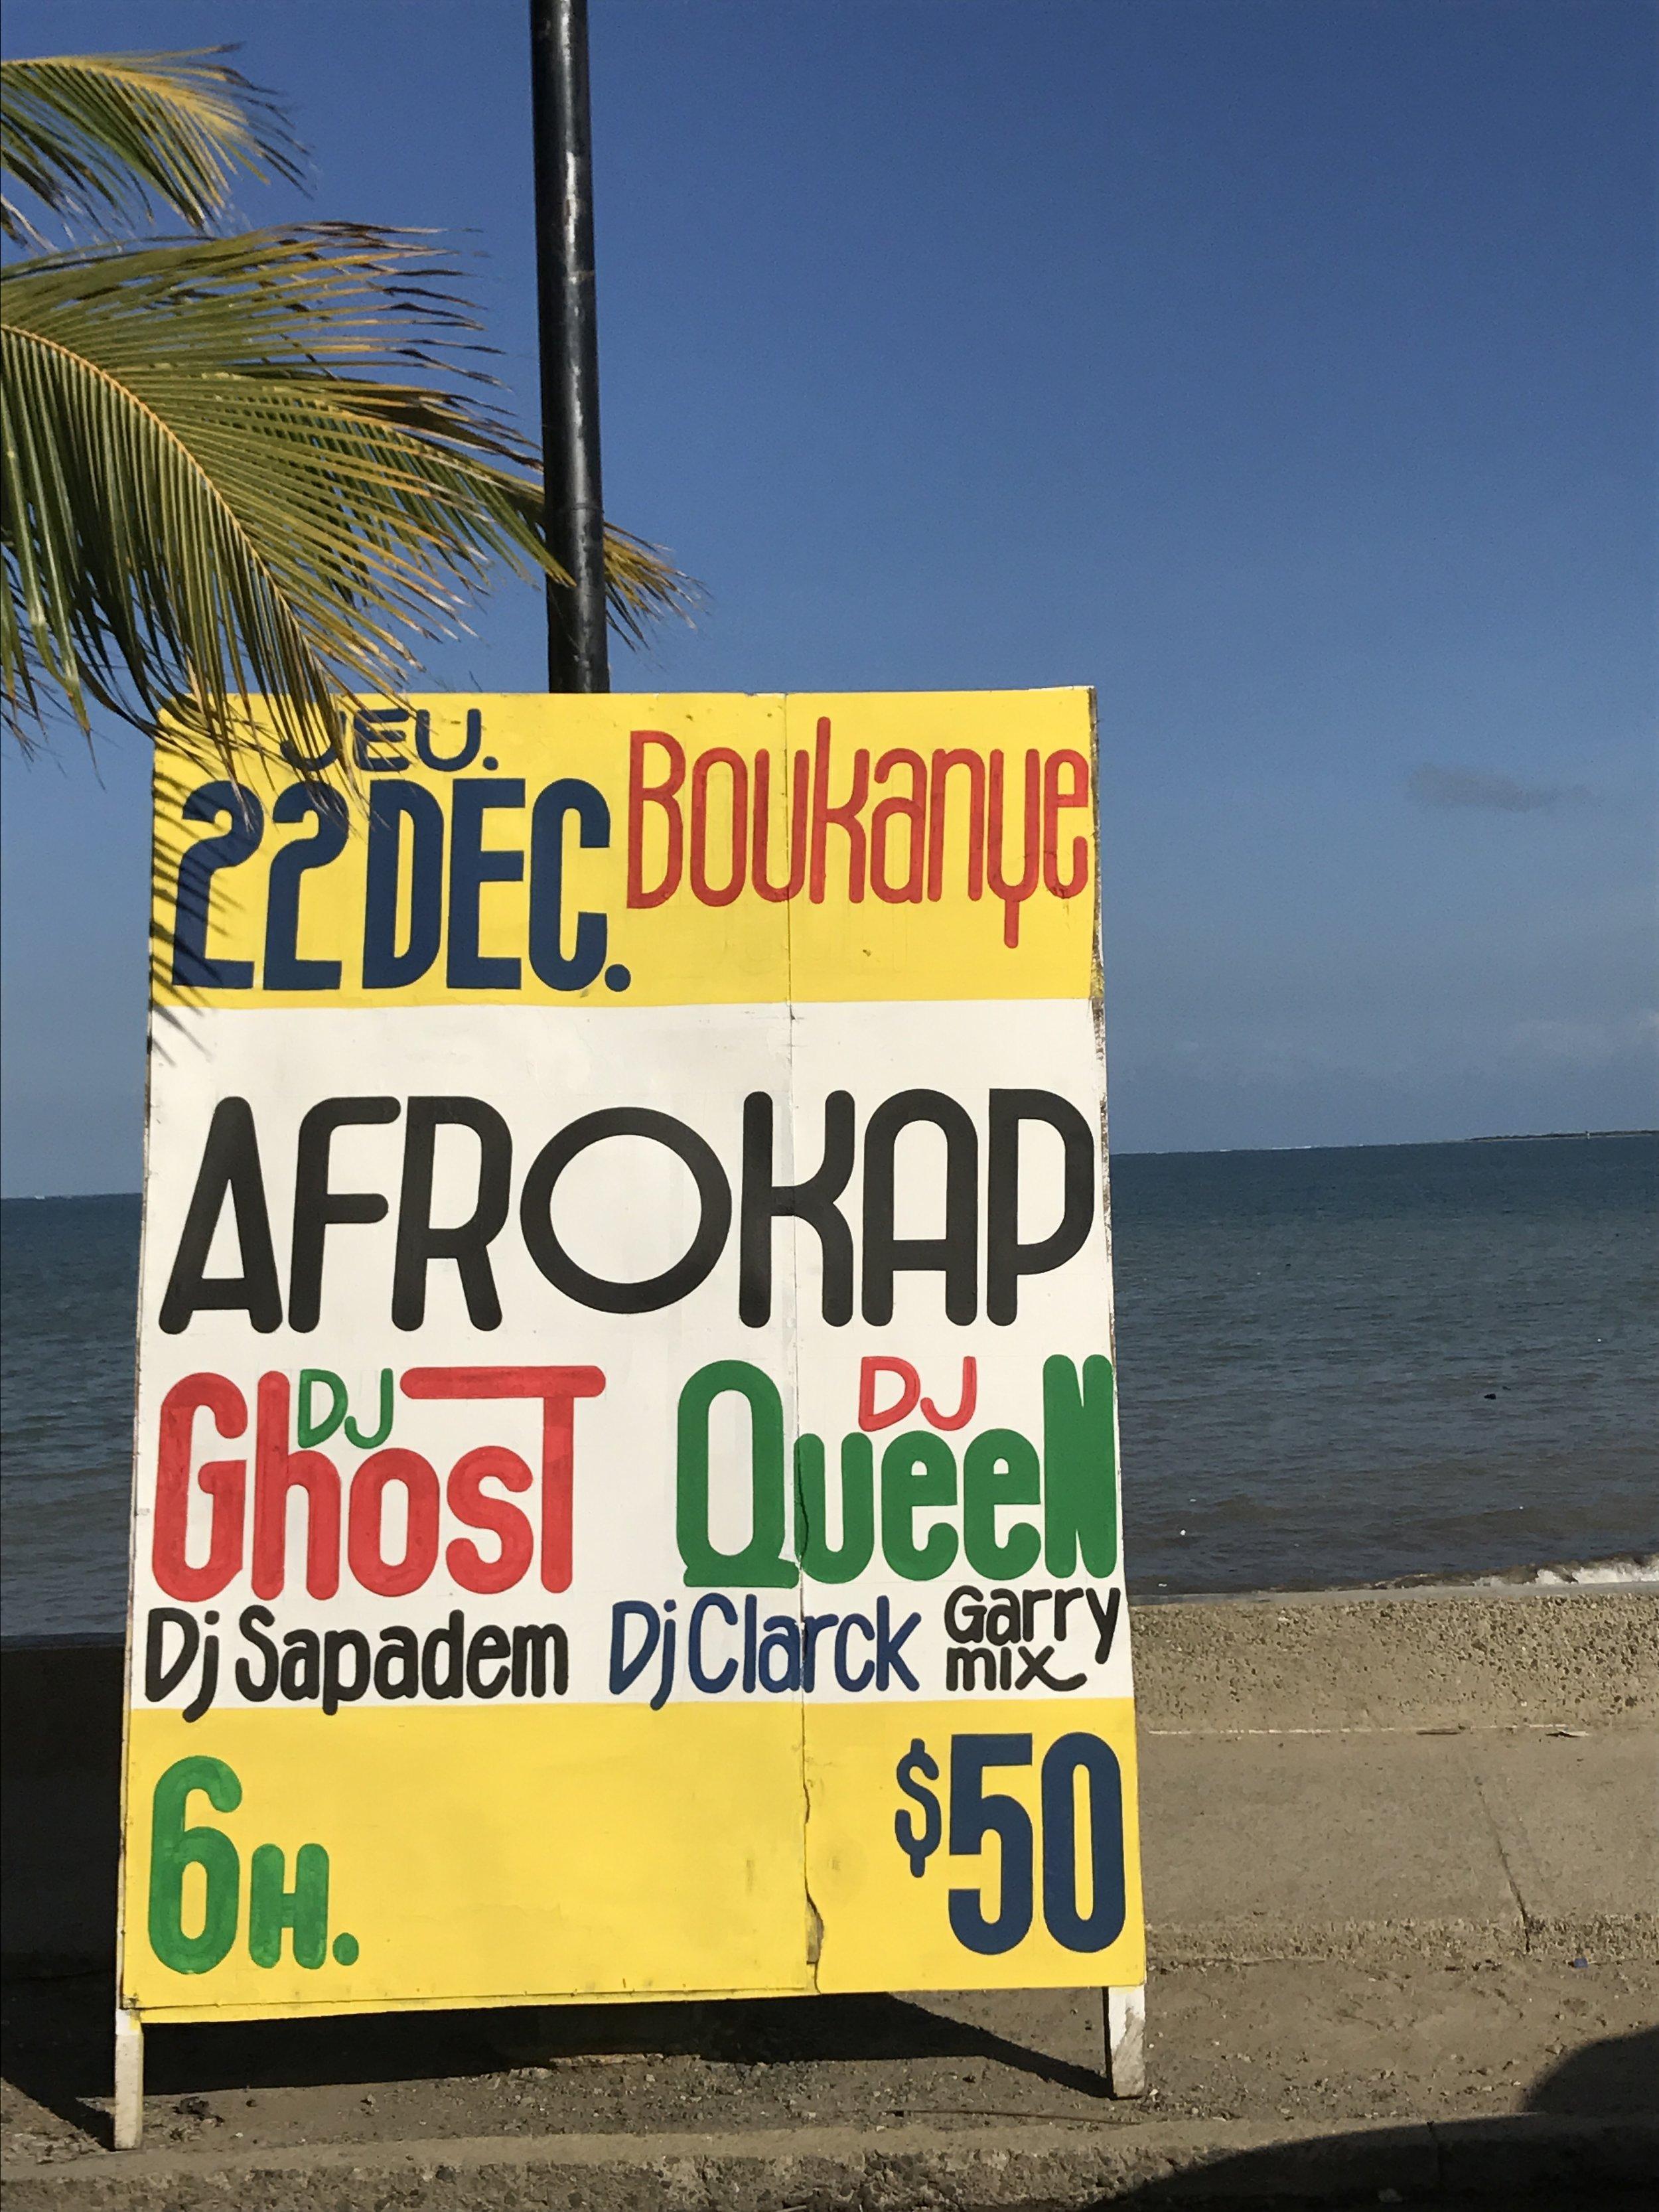 Signboards advertising performances at Boukanye.